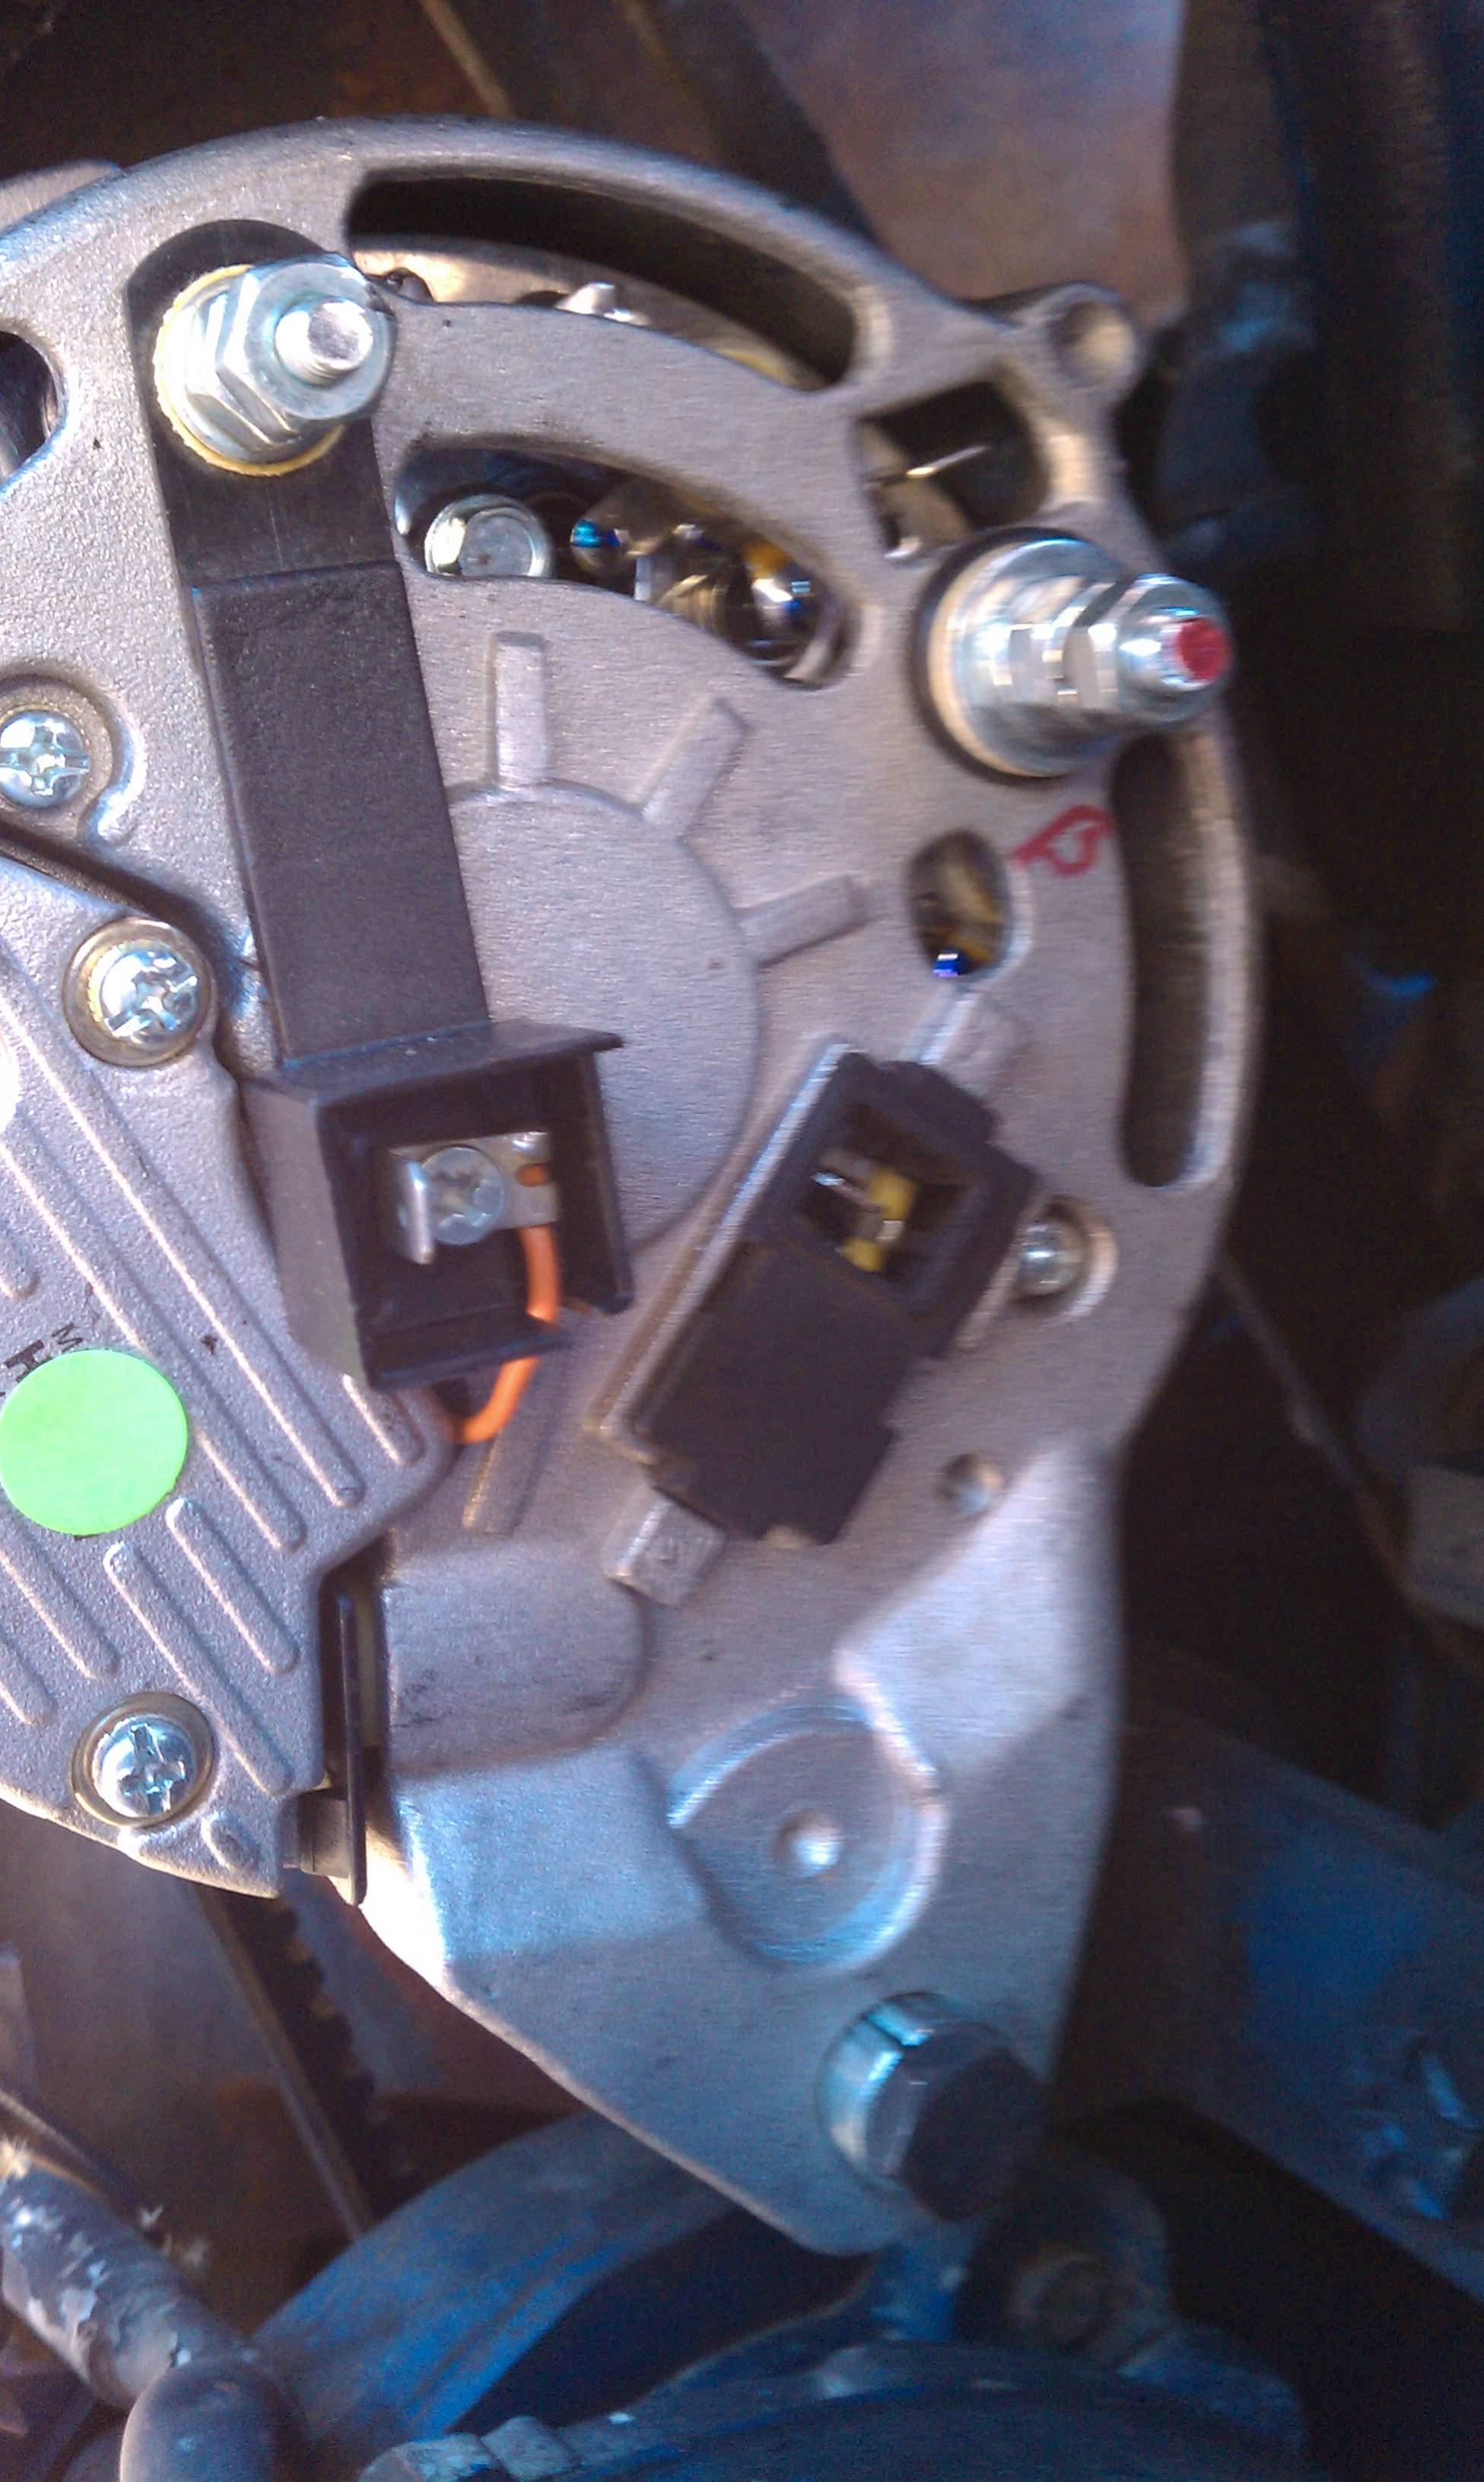 [TBQL_4184]  HB_0532] Farmtrac Tractor Alternator Wiring Diagram Schematic Wiring   Farmtrac Tractor Alternator Wiring Diagram      Phil Cran Trofu Pead Phae Mohammedshrine Librar Wiring 101